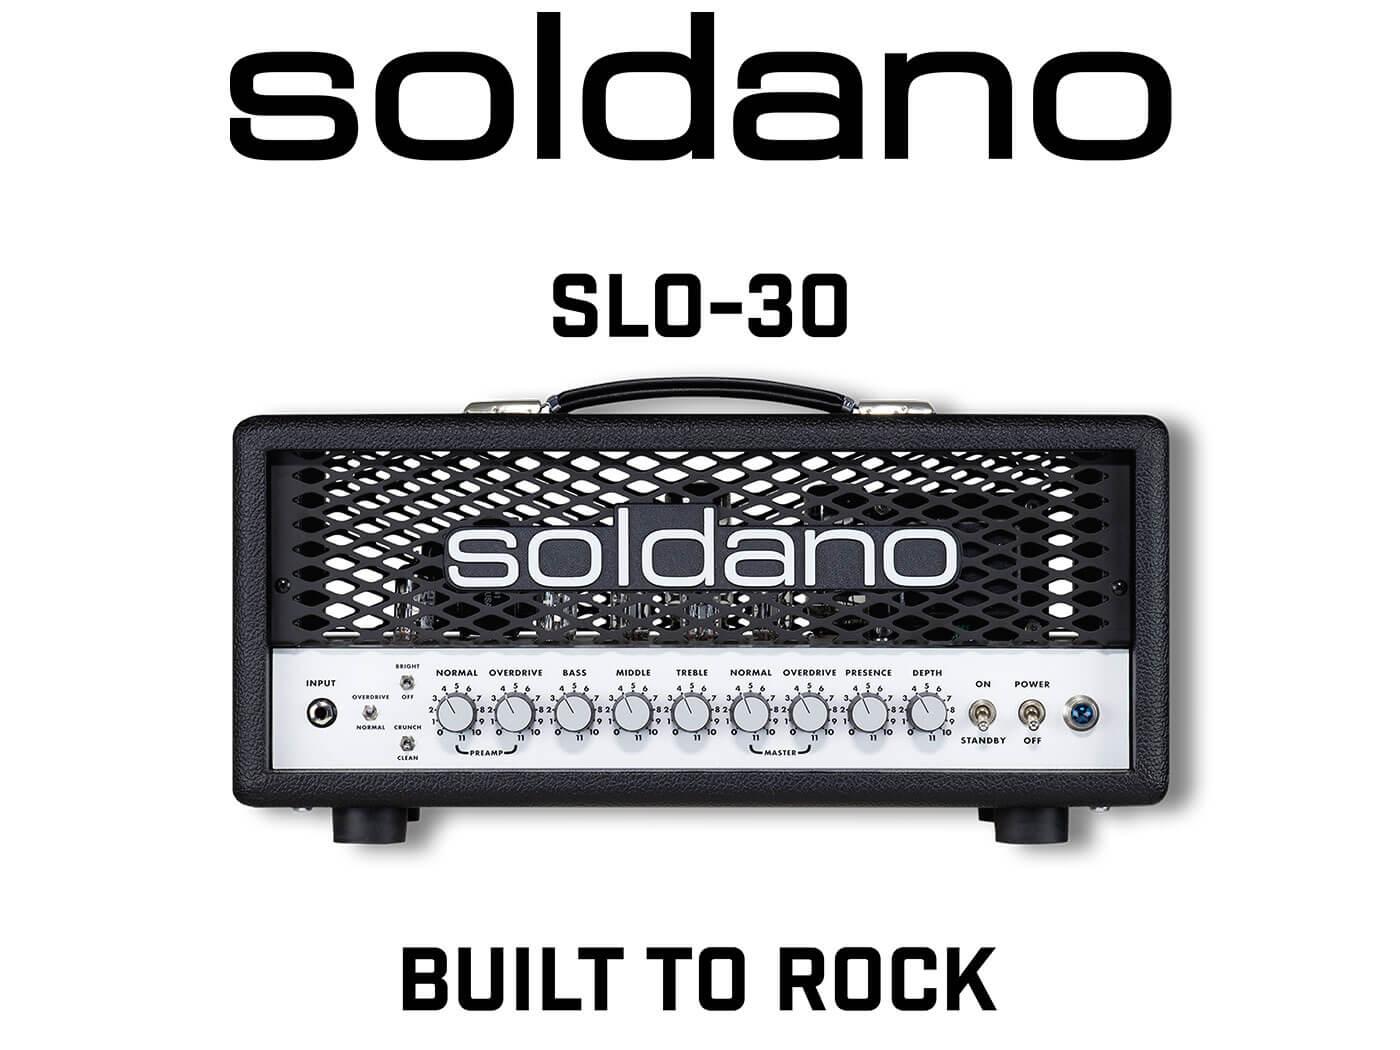 The Soldano SLO-30